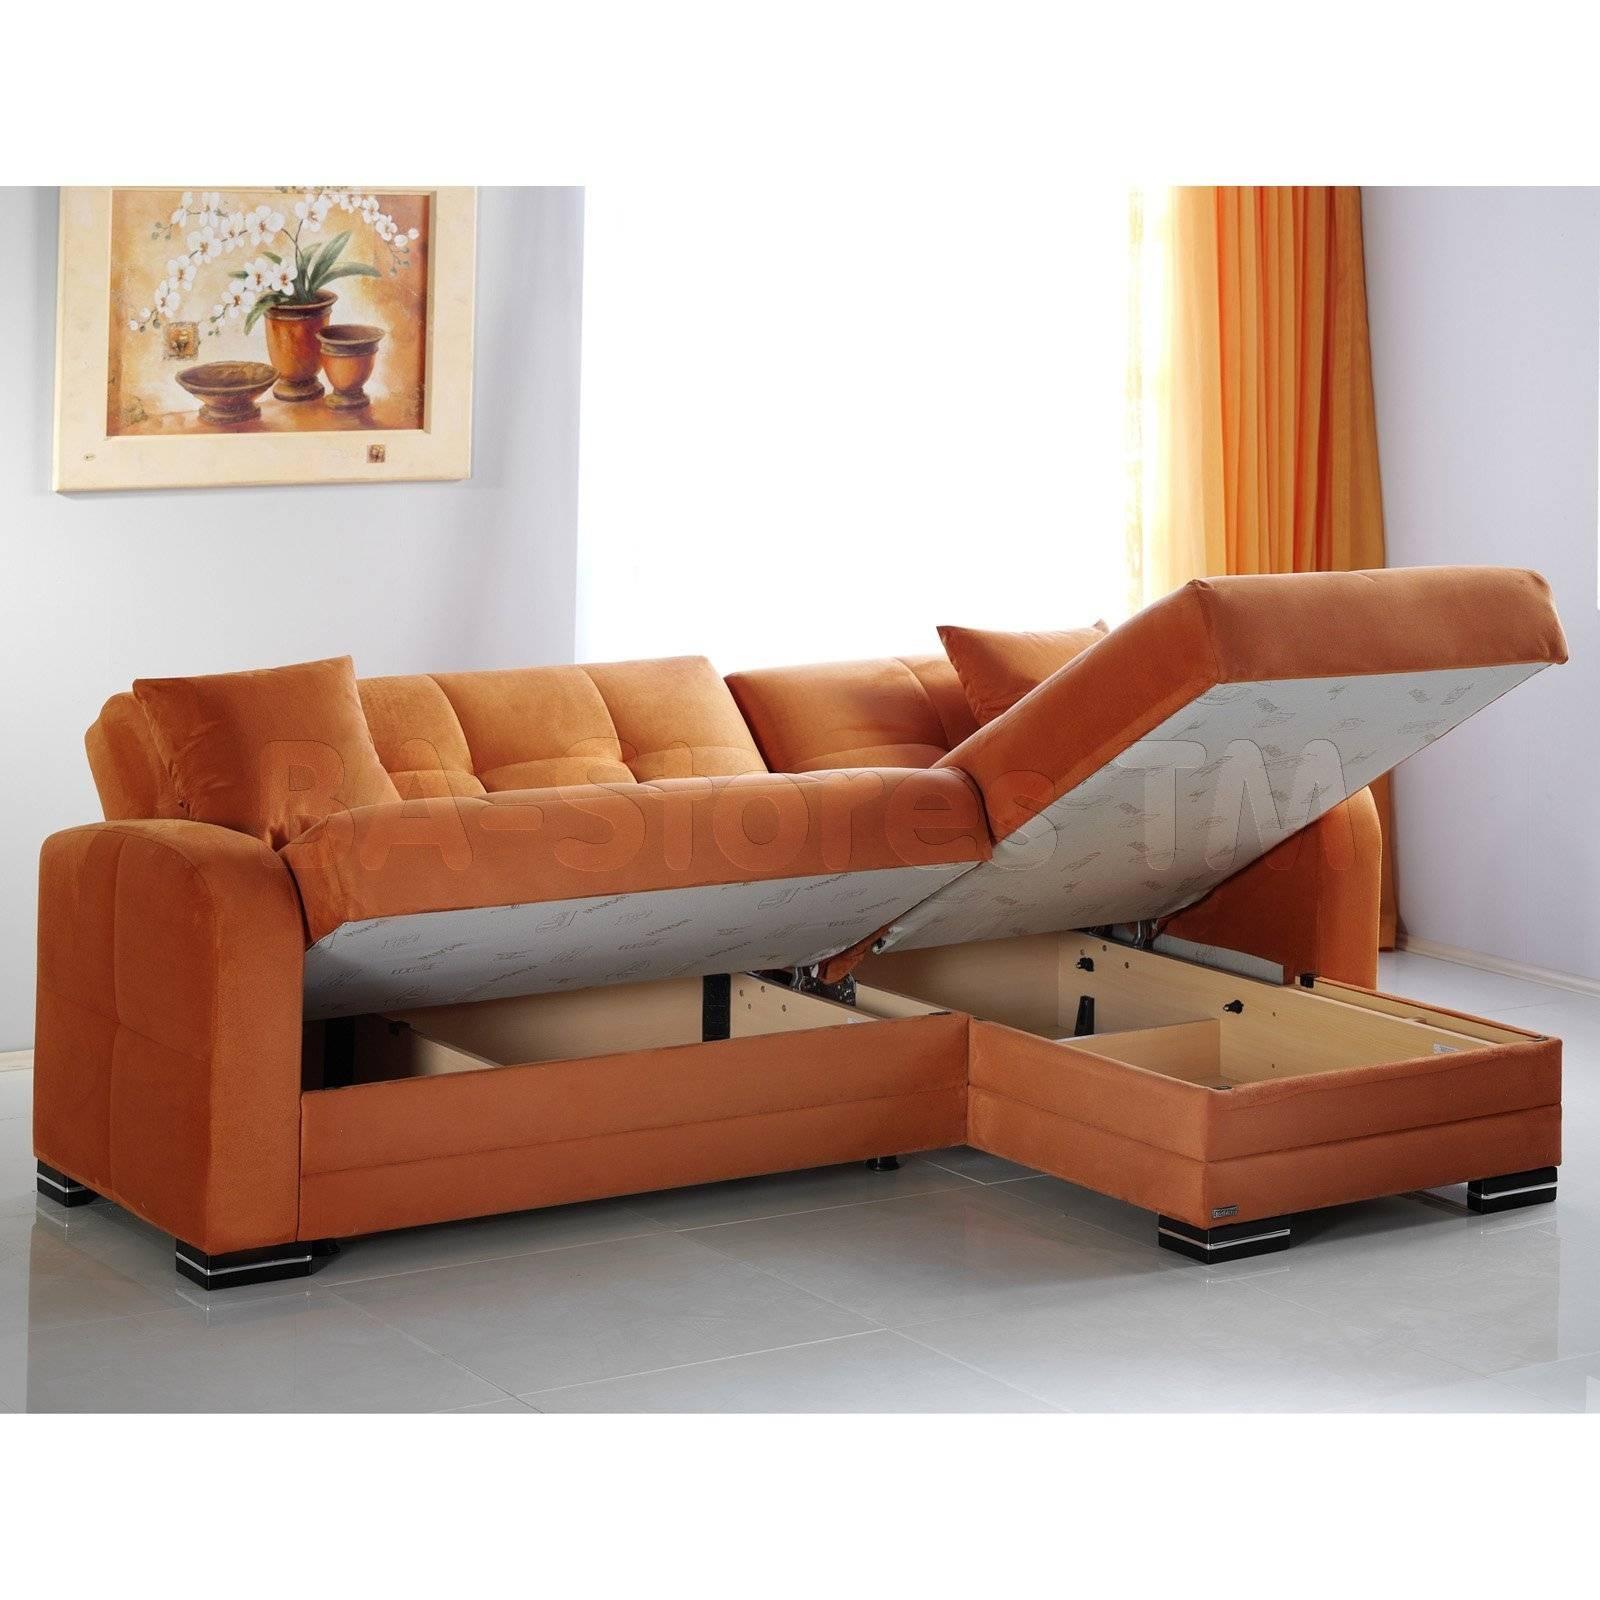 Burnt Orange Sectional Sofa - Cleanupflorida in Burnt Orange Leather Sectional Sofas (Image 4 of 15)